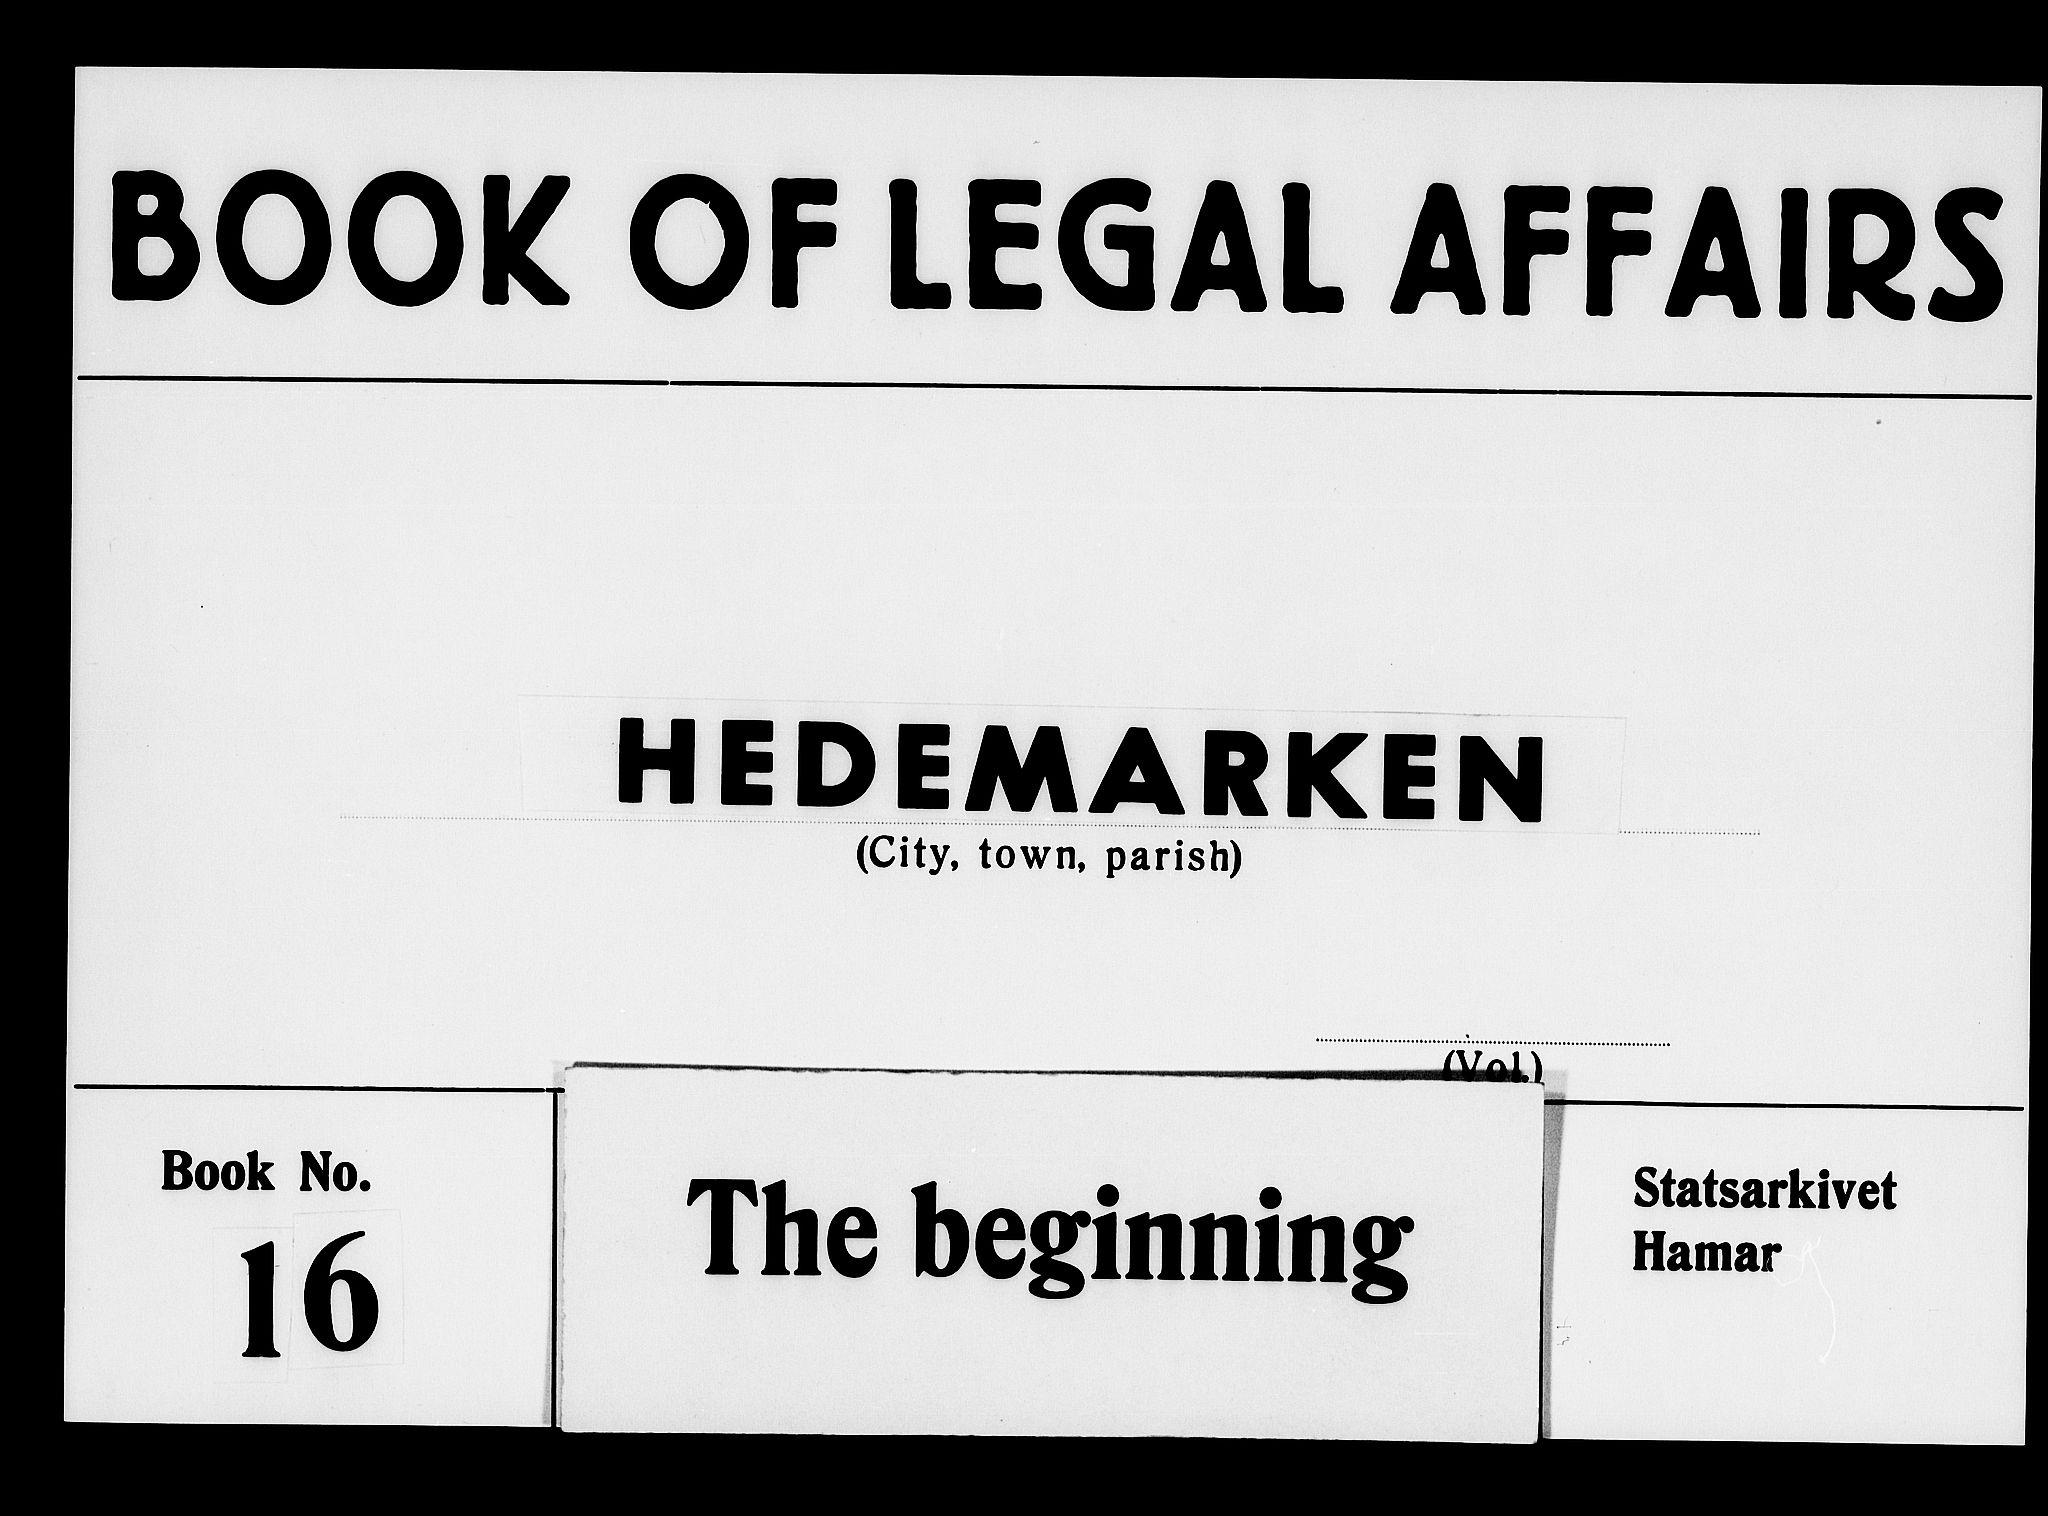 SAH, Hedemarken sorenskriveri, G/Gb/L0017: Tingbok, 1681